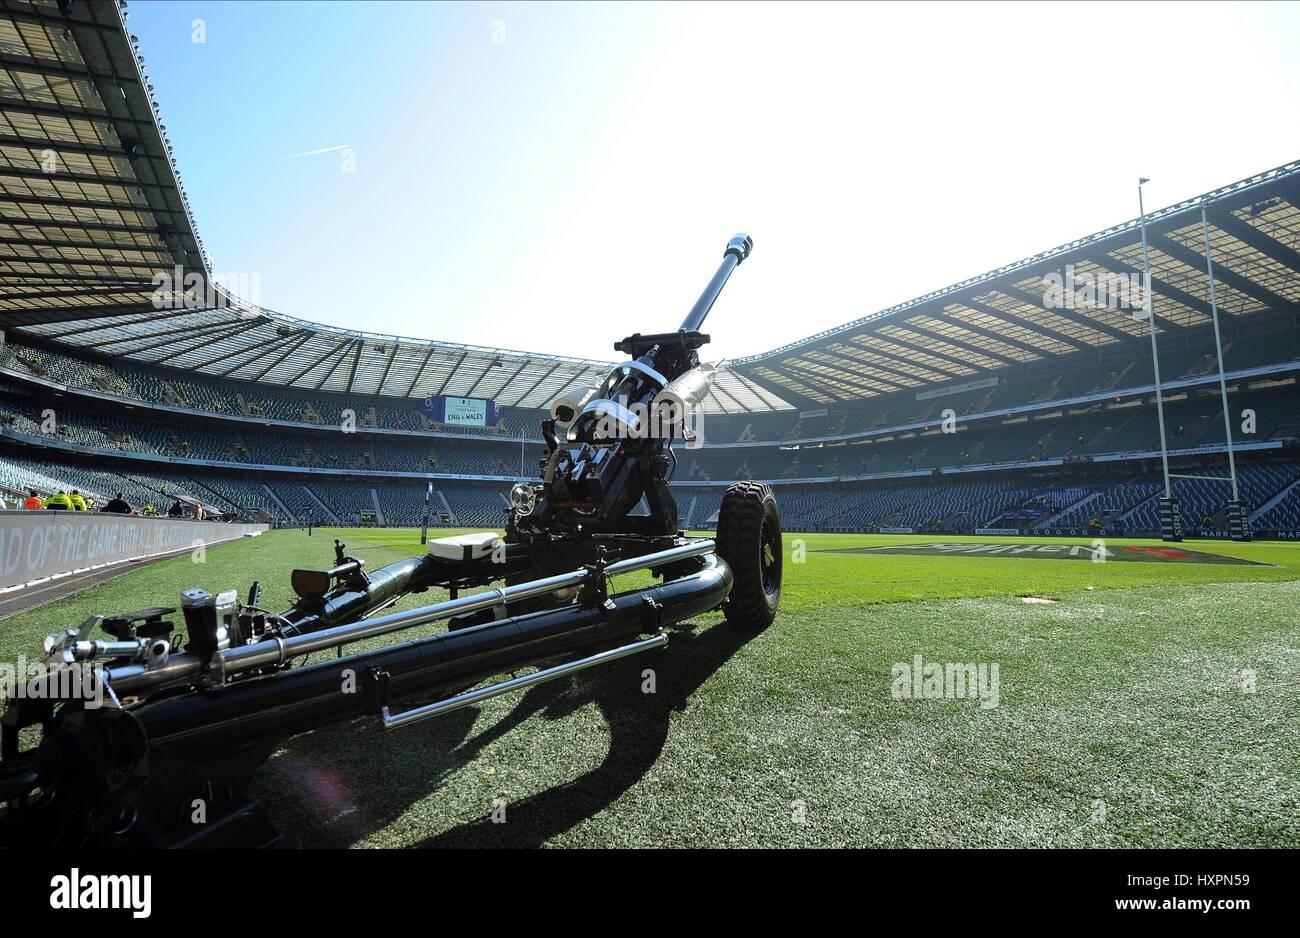 Gli onorevoli artiglieria COMPA INGHILTERRA RU V GALLES INGHILTERRA RU V GALLES RU TWICKENHAM Londra Inghilterra Immagini Stock